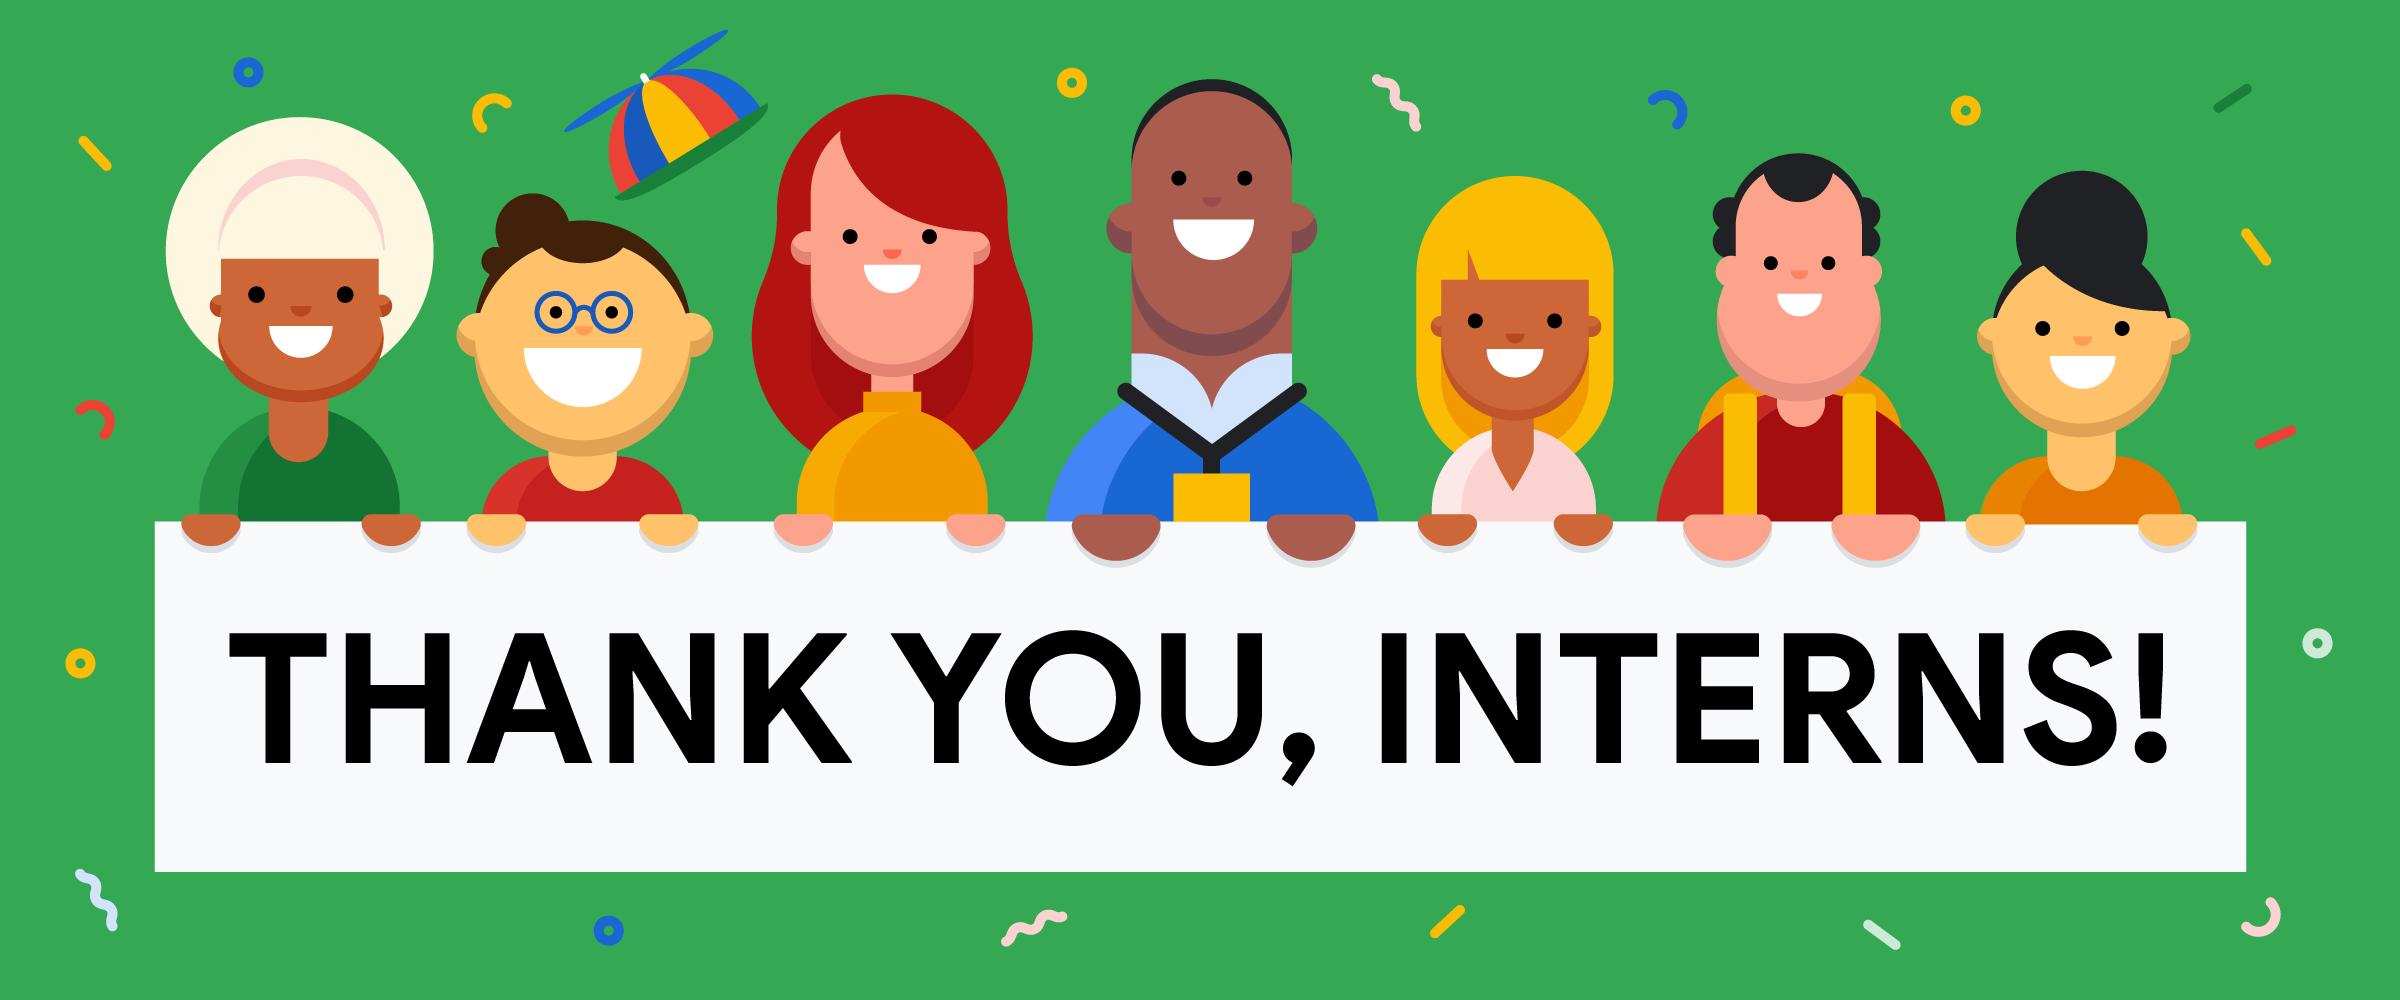 Meet six Google interns on National Intern Day.